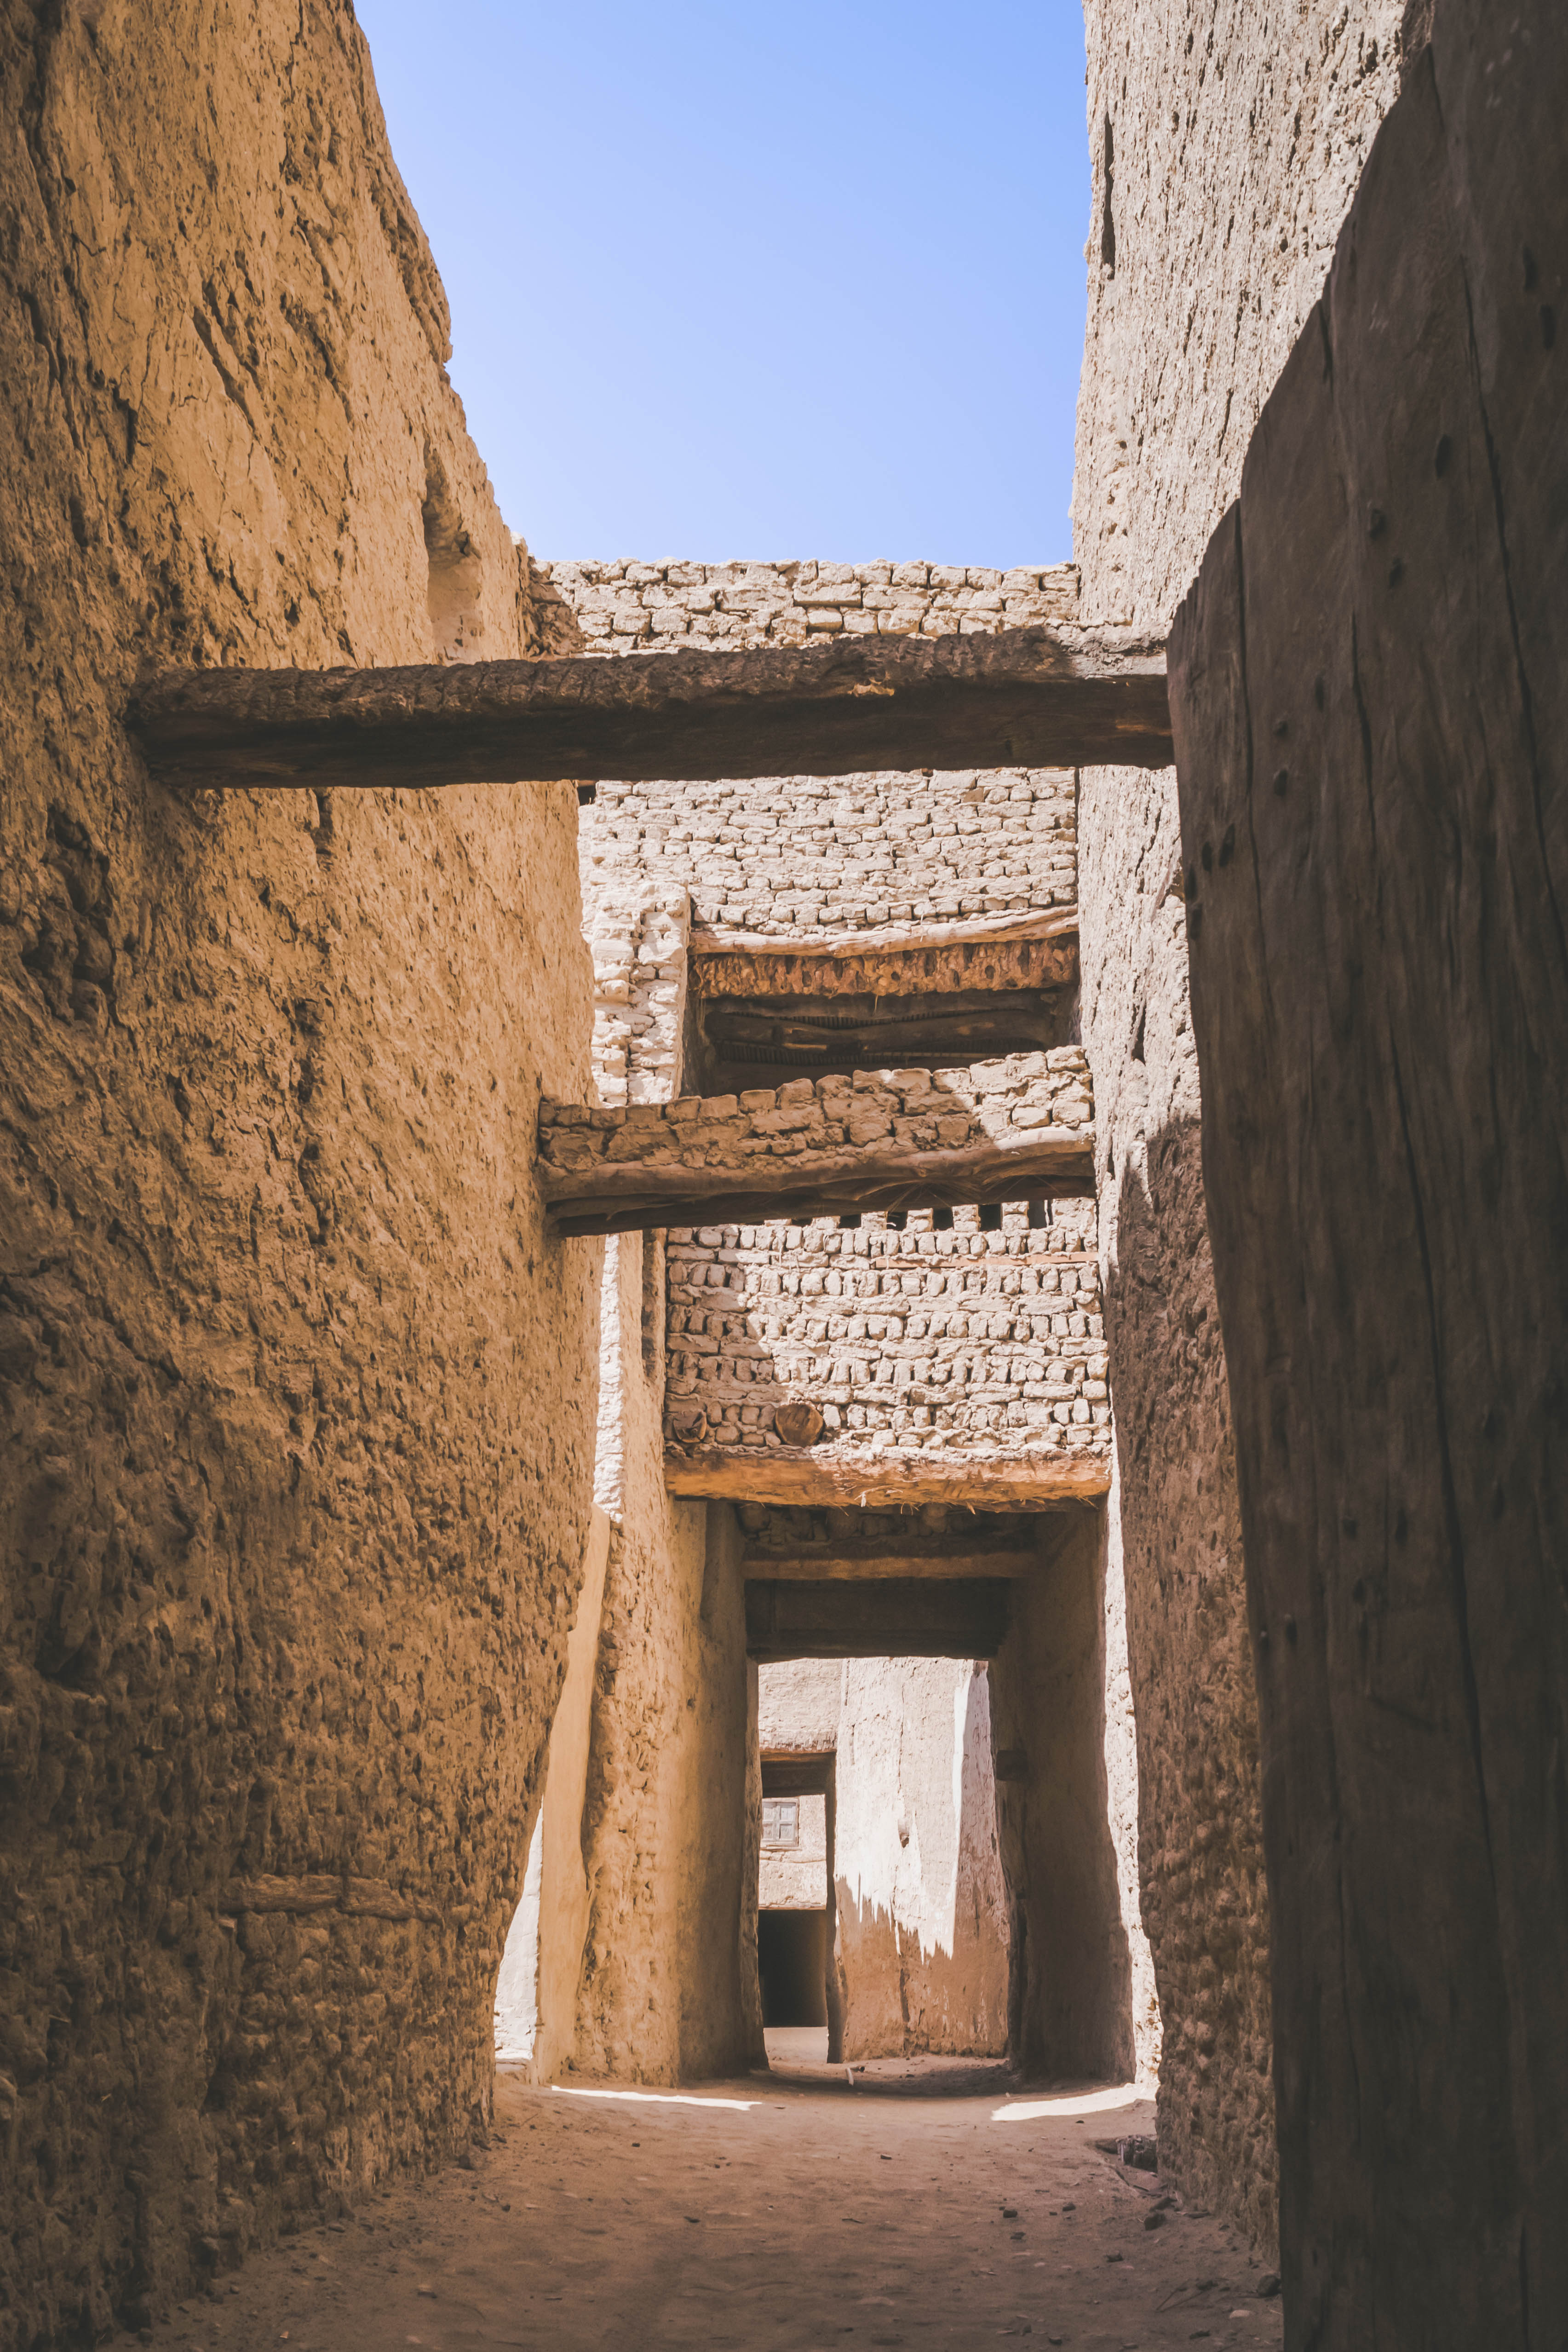 Dakhla, Egypt